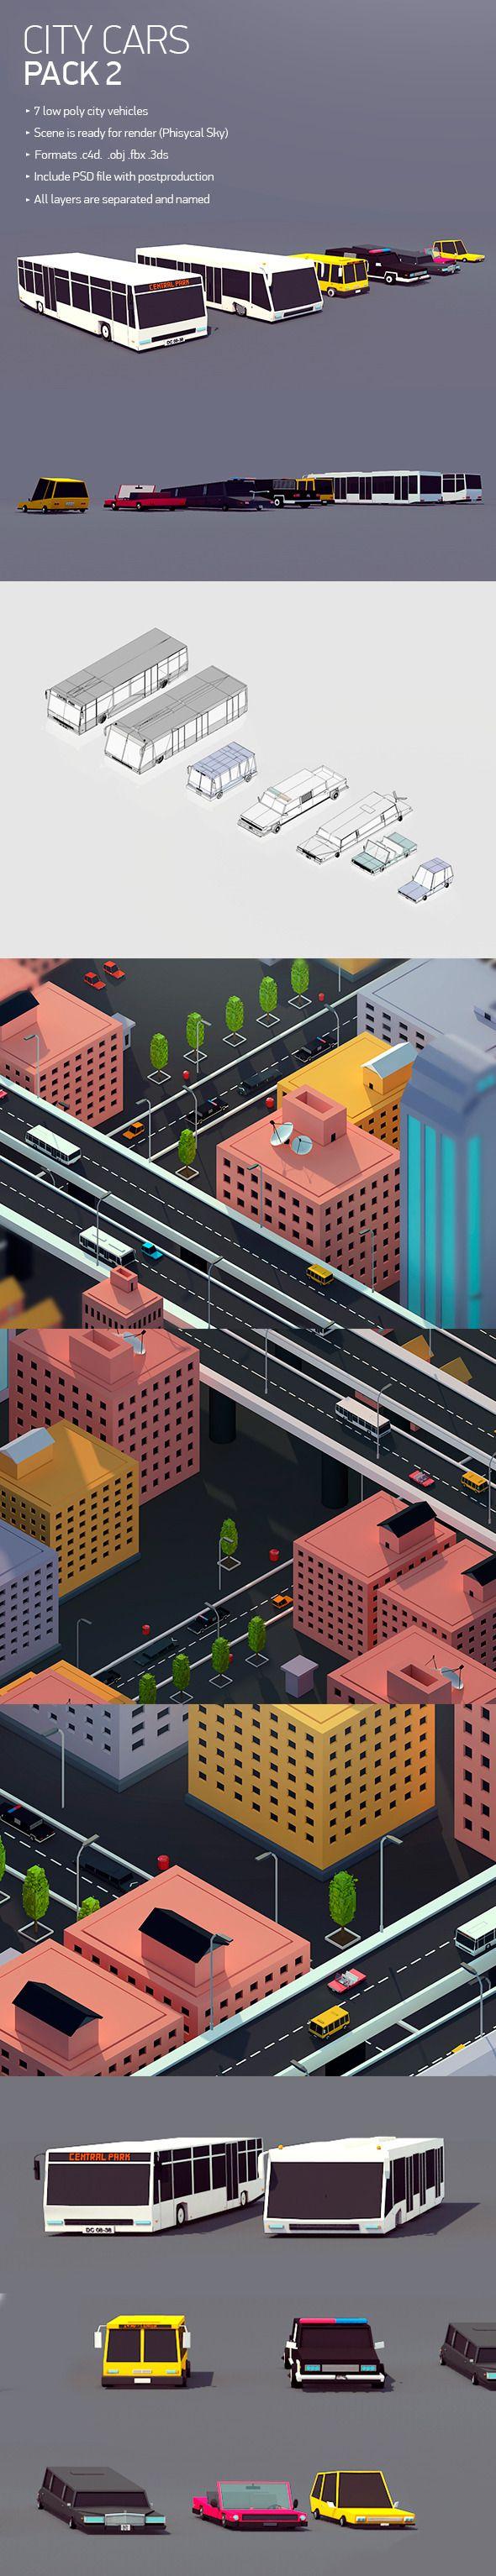 Low poly City Car Pack 2 3D Models Design Template #cinema4d #3D Download here: https://3docean.net/item/low-poly-city-car-pack-2/12764701?ref=yinkira